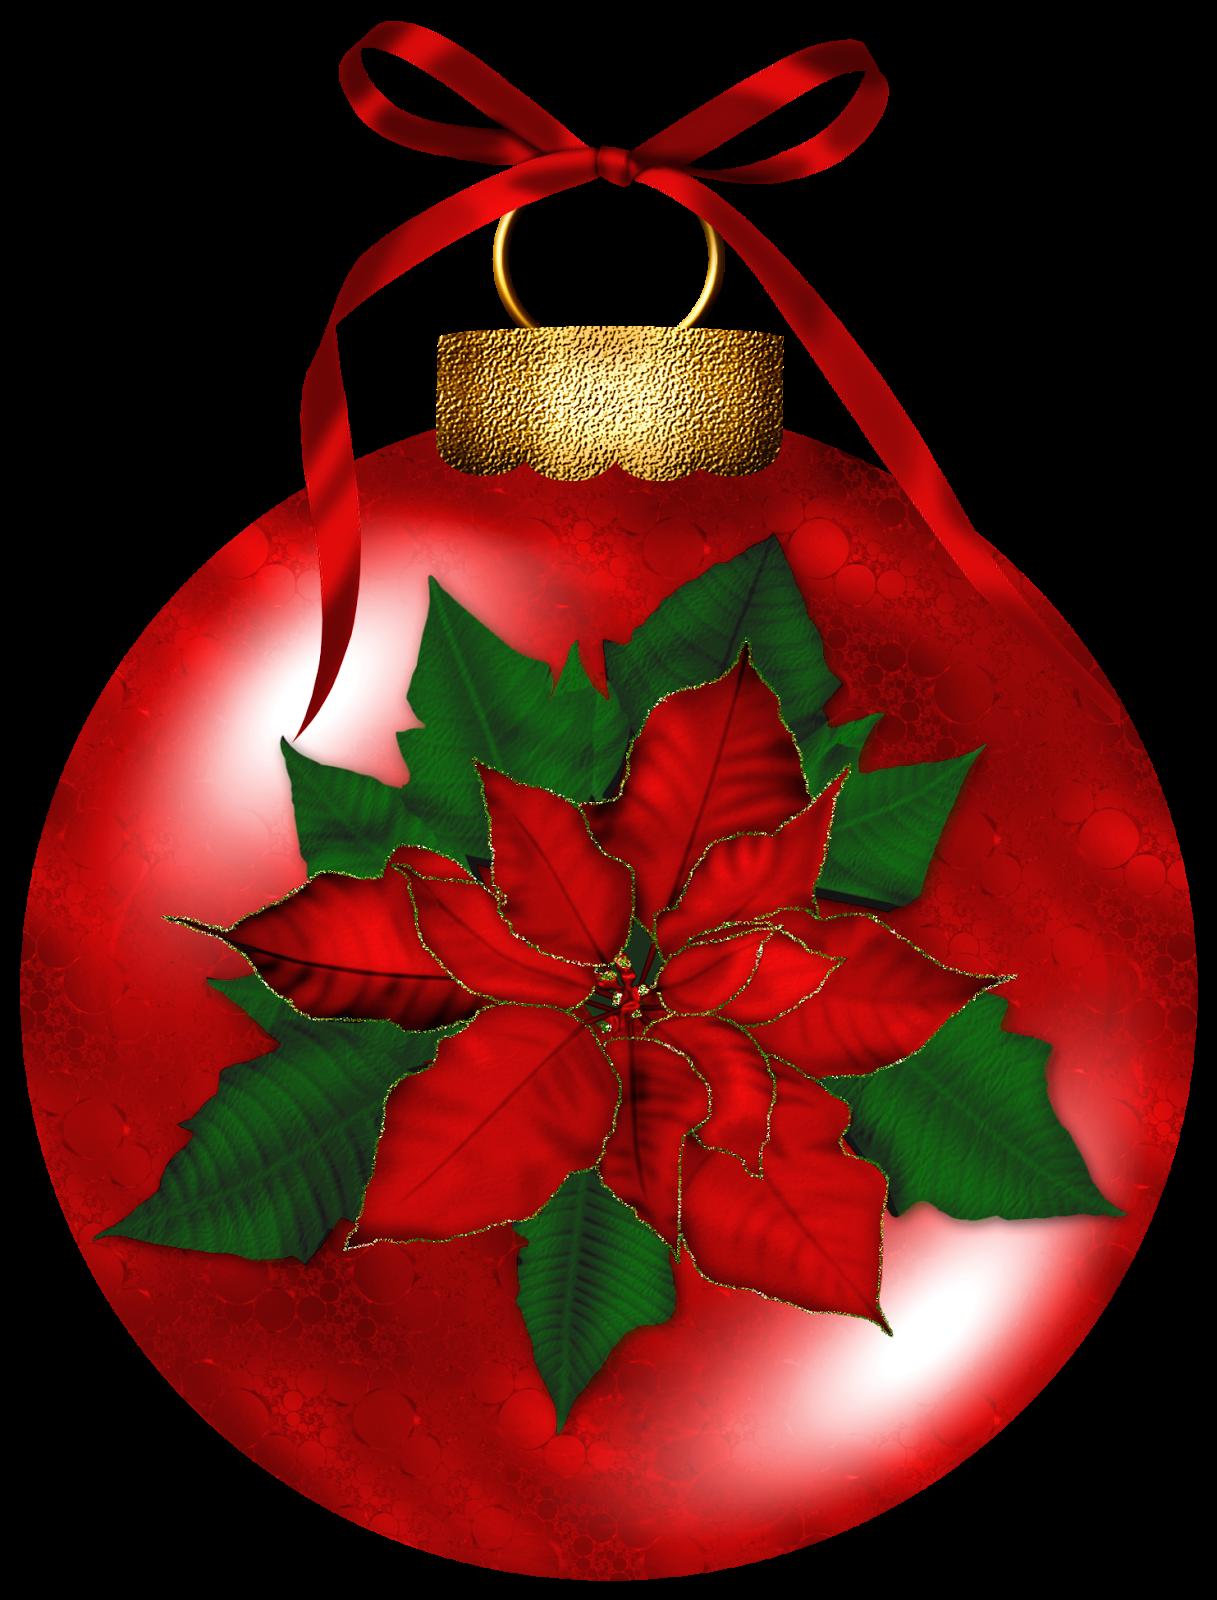 Poinsettia clipart ornament. Kaneohe neighborhood board blog